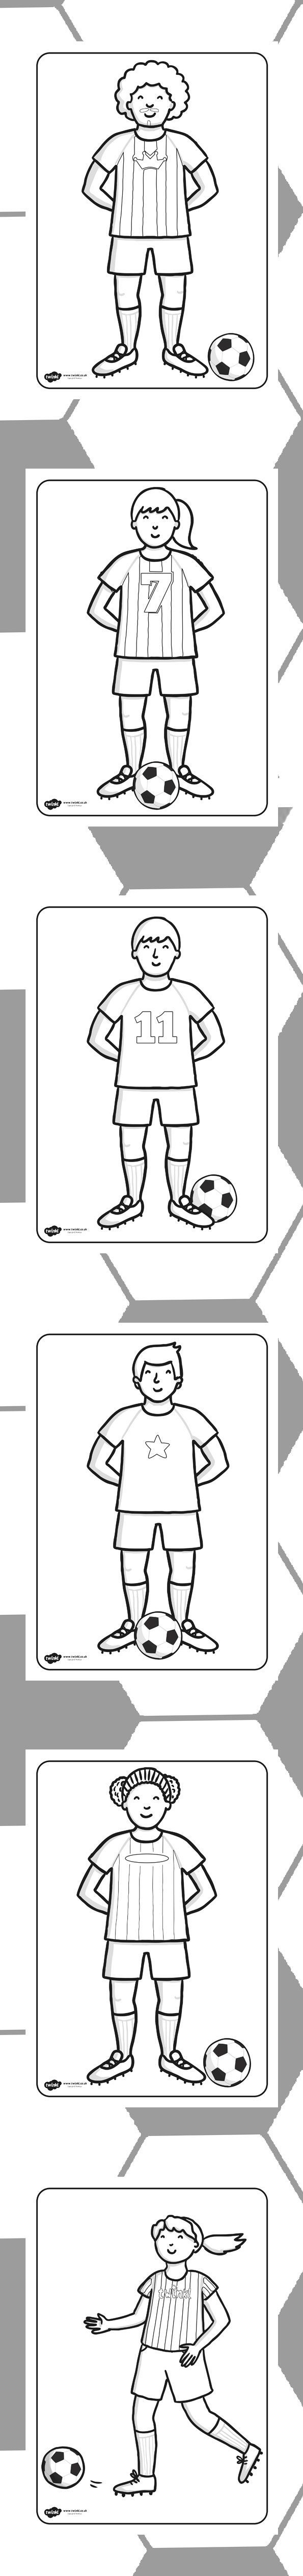 149 best foci images on pinterest birthdays futbol and templates